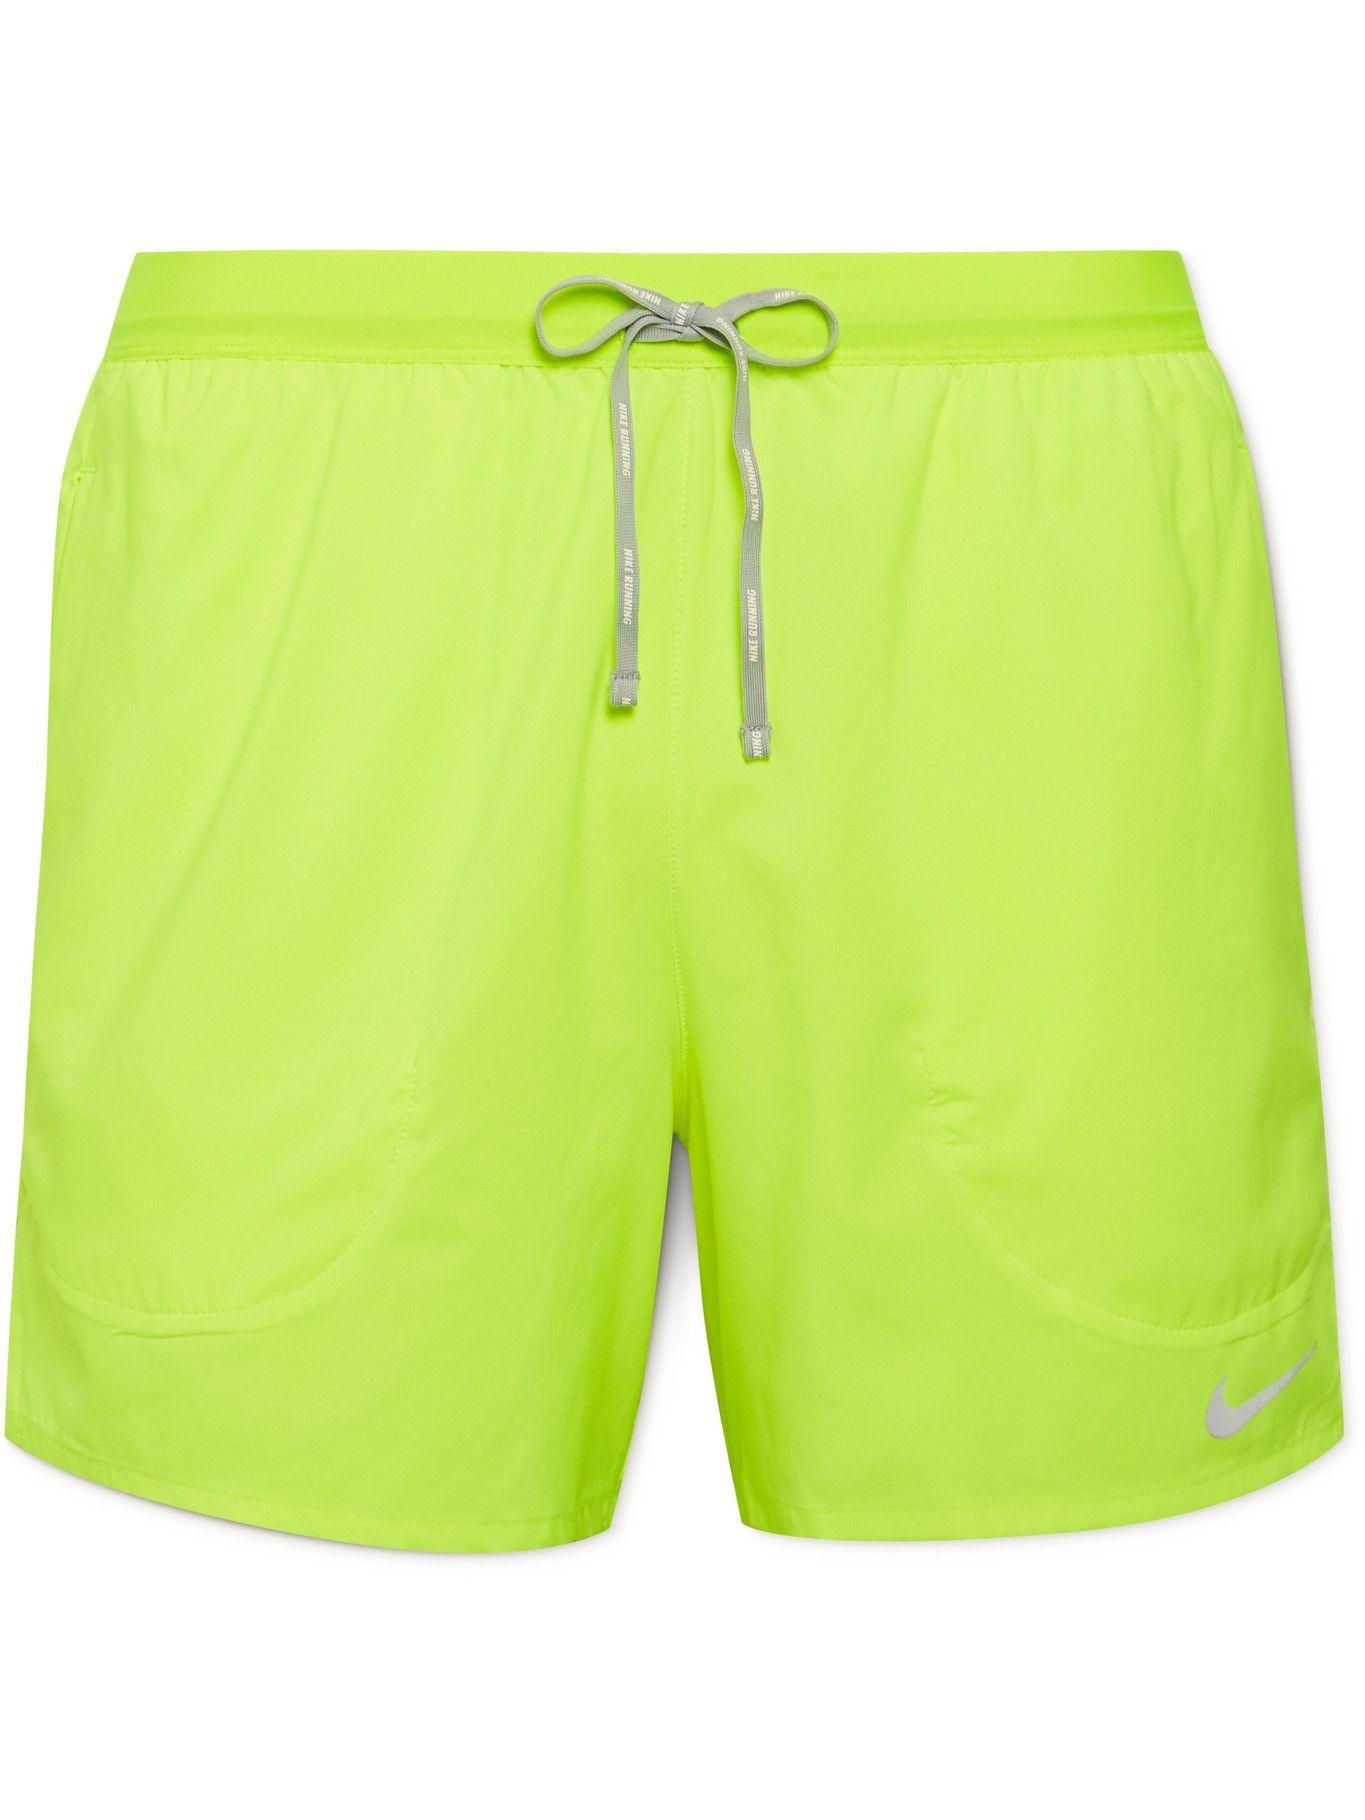 Photo: Nike Running - Flex Stride Dri-FIT Running Shorts - Green